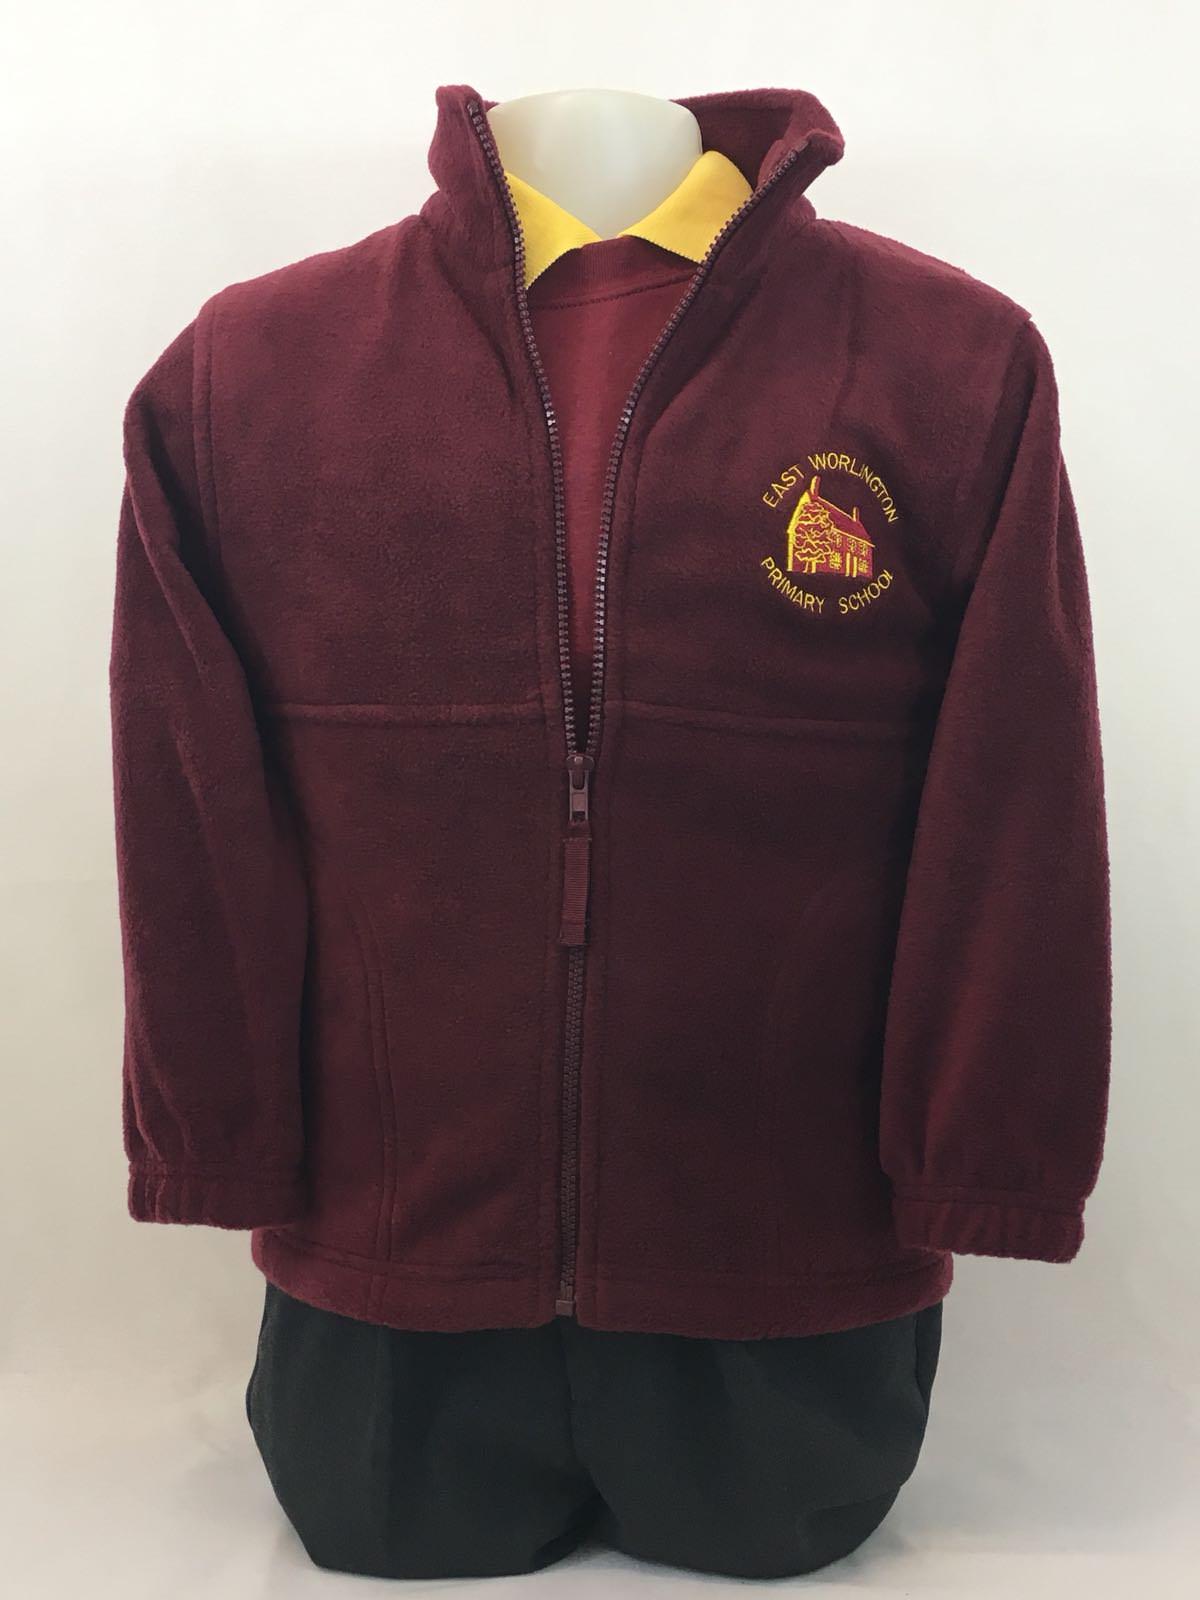 ddab0af94 East Worlington Primary School Fleece